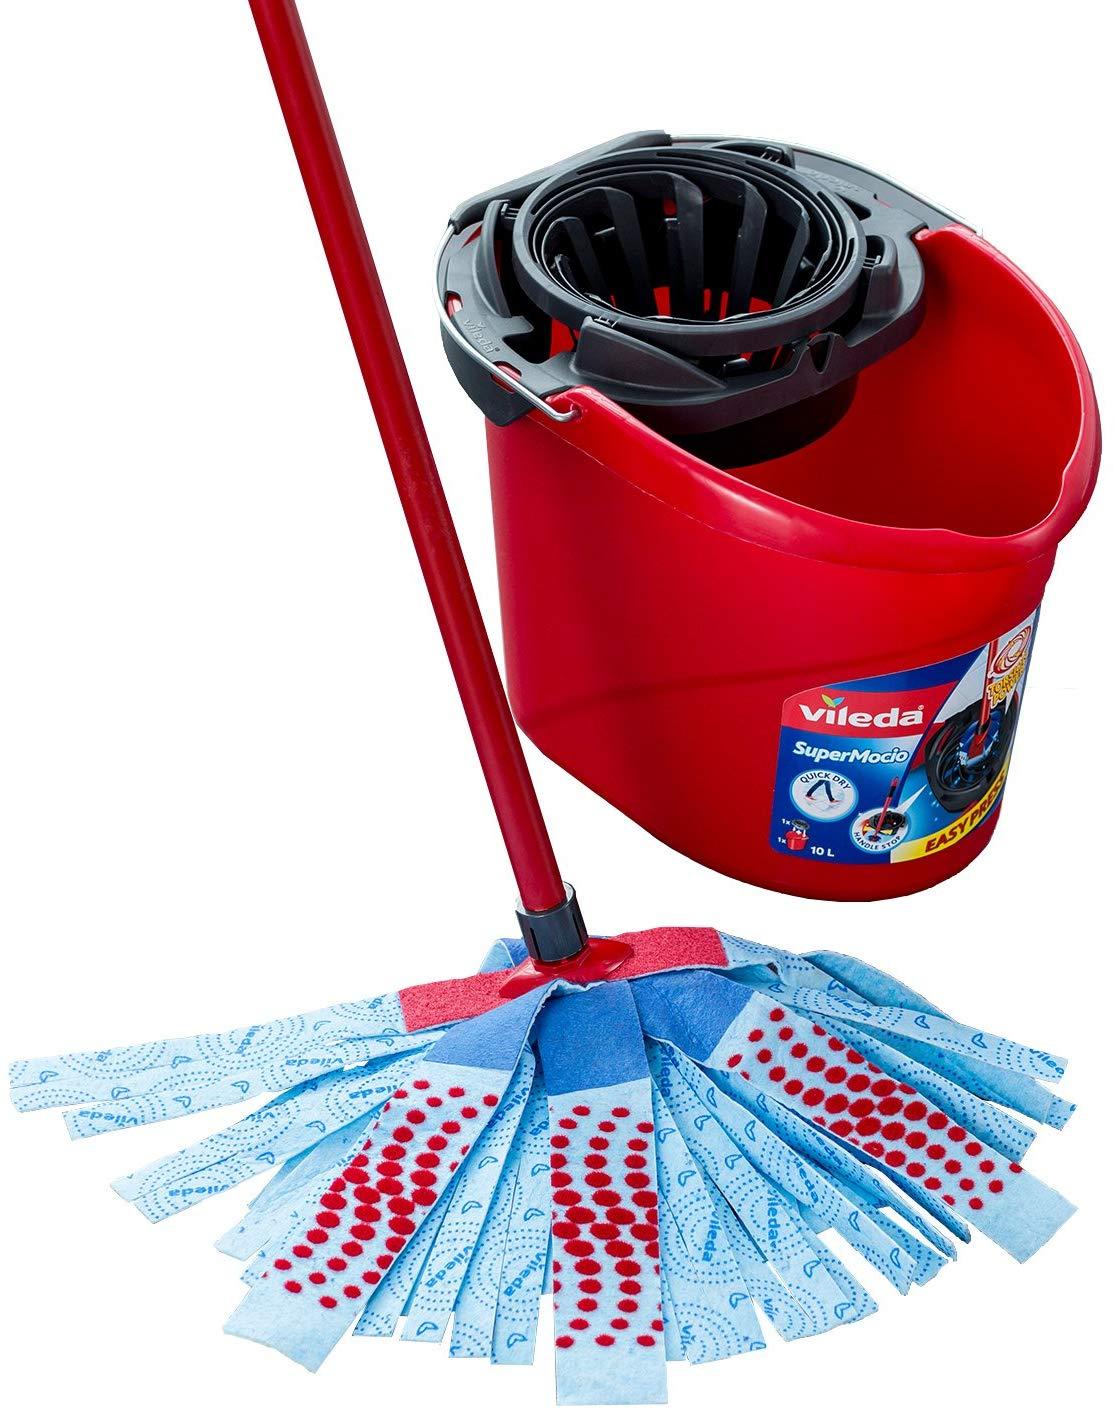 Vileda SuperMocio 3Action XL Mop and Bucket Set, Red/Blue £12.75 at Amazon Prime / £17.24 Non Prime